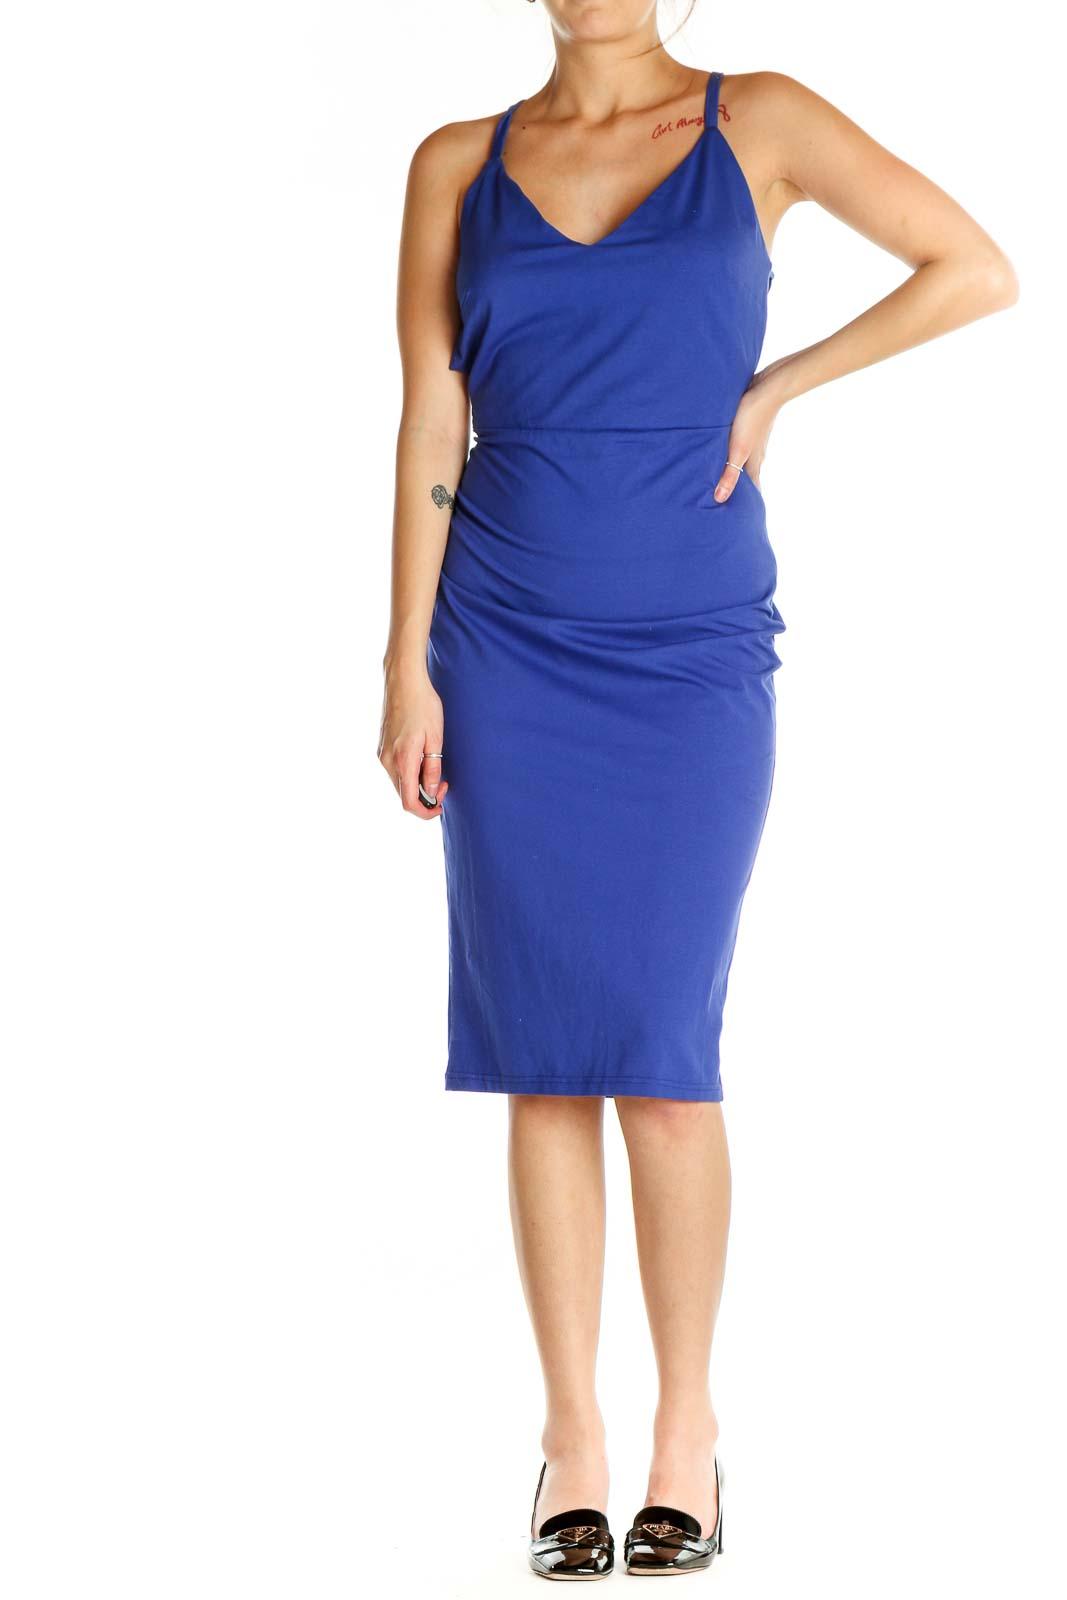 Blue Solid Classic Sheath Dress Front